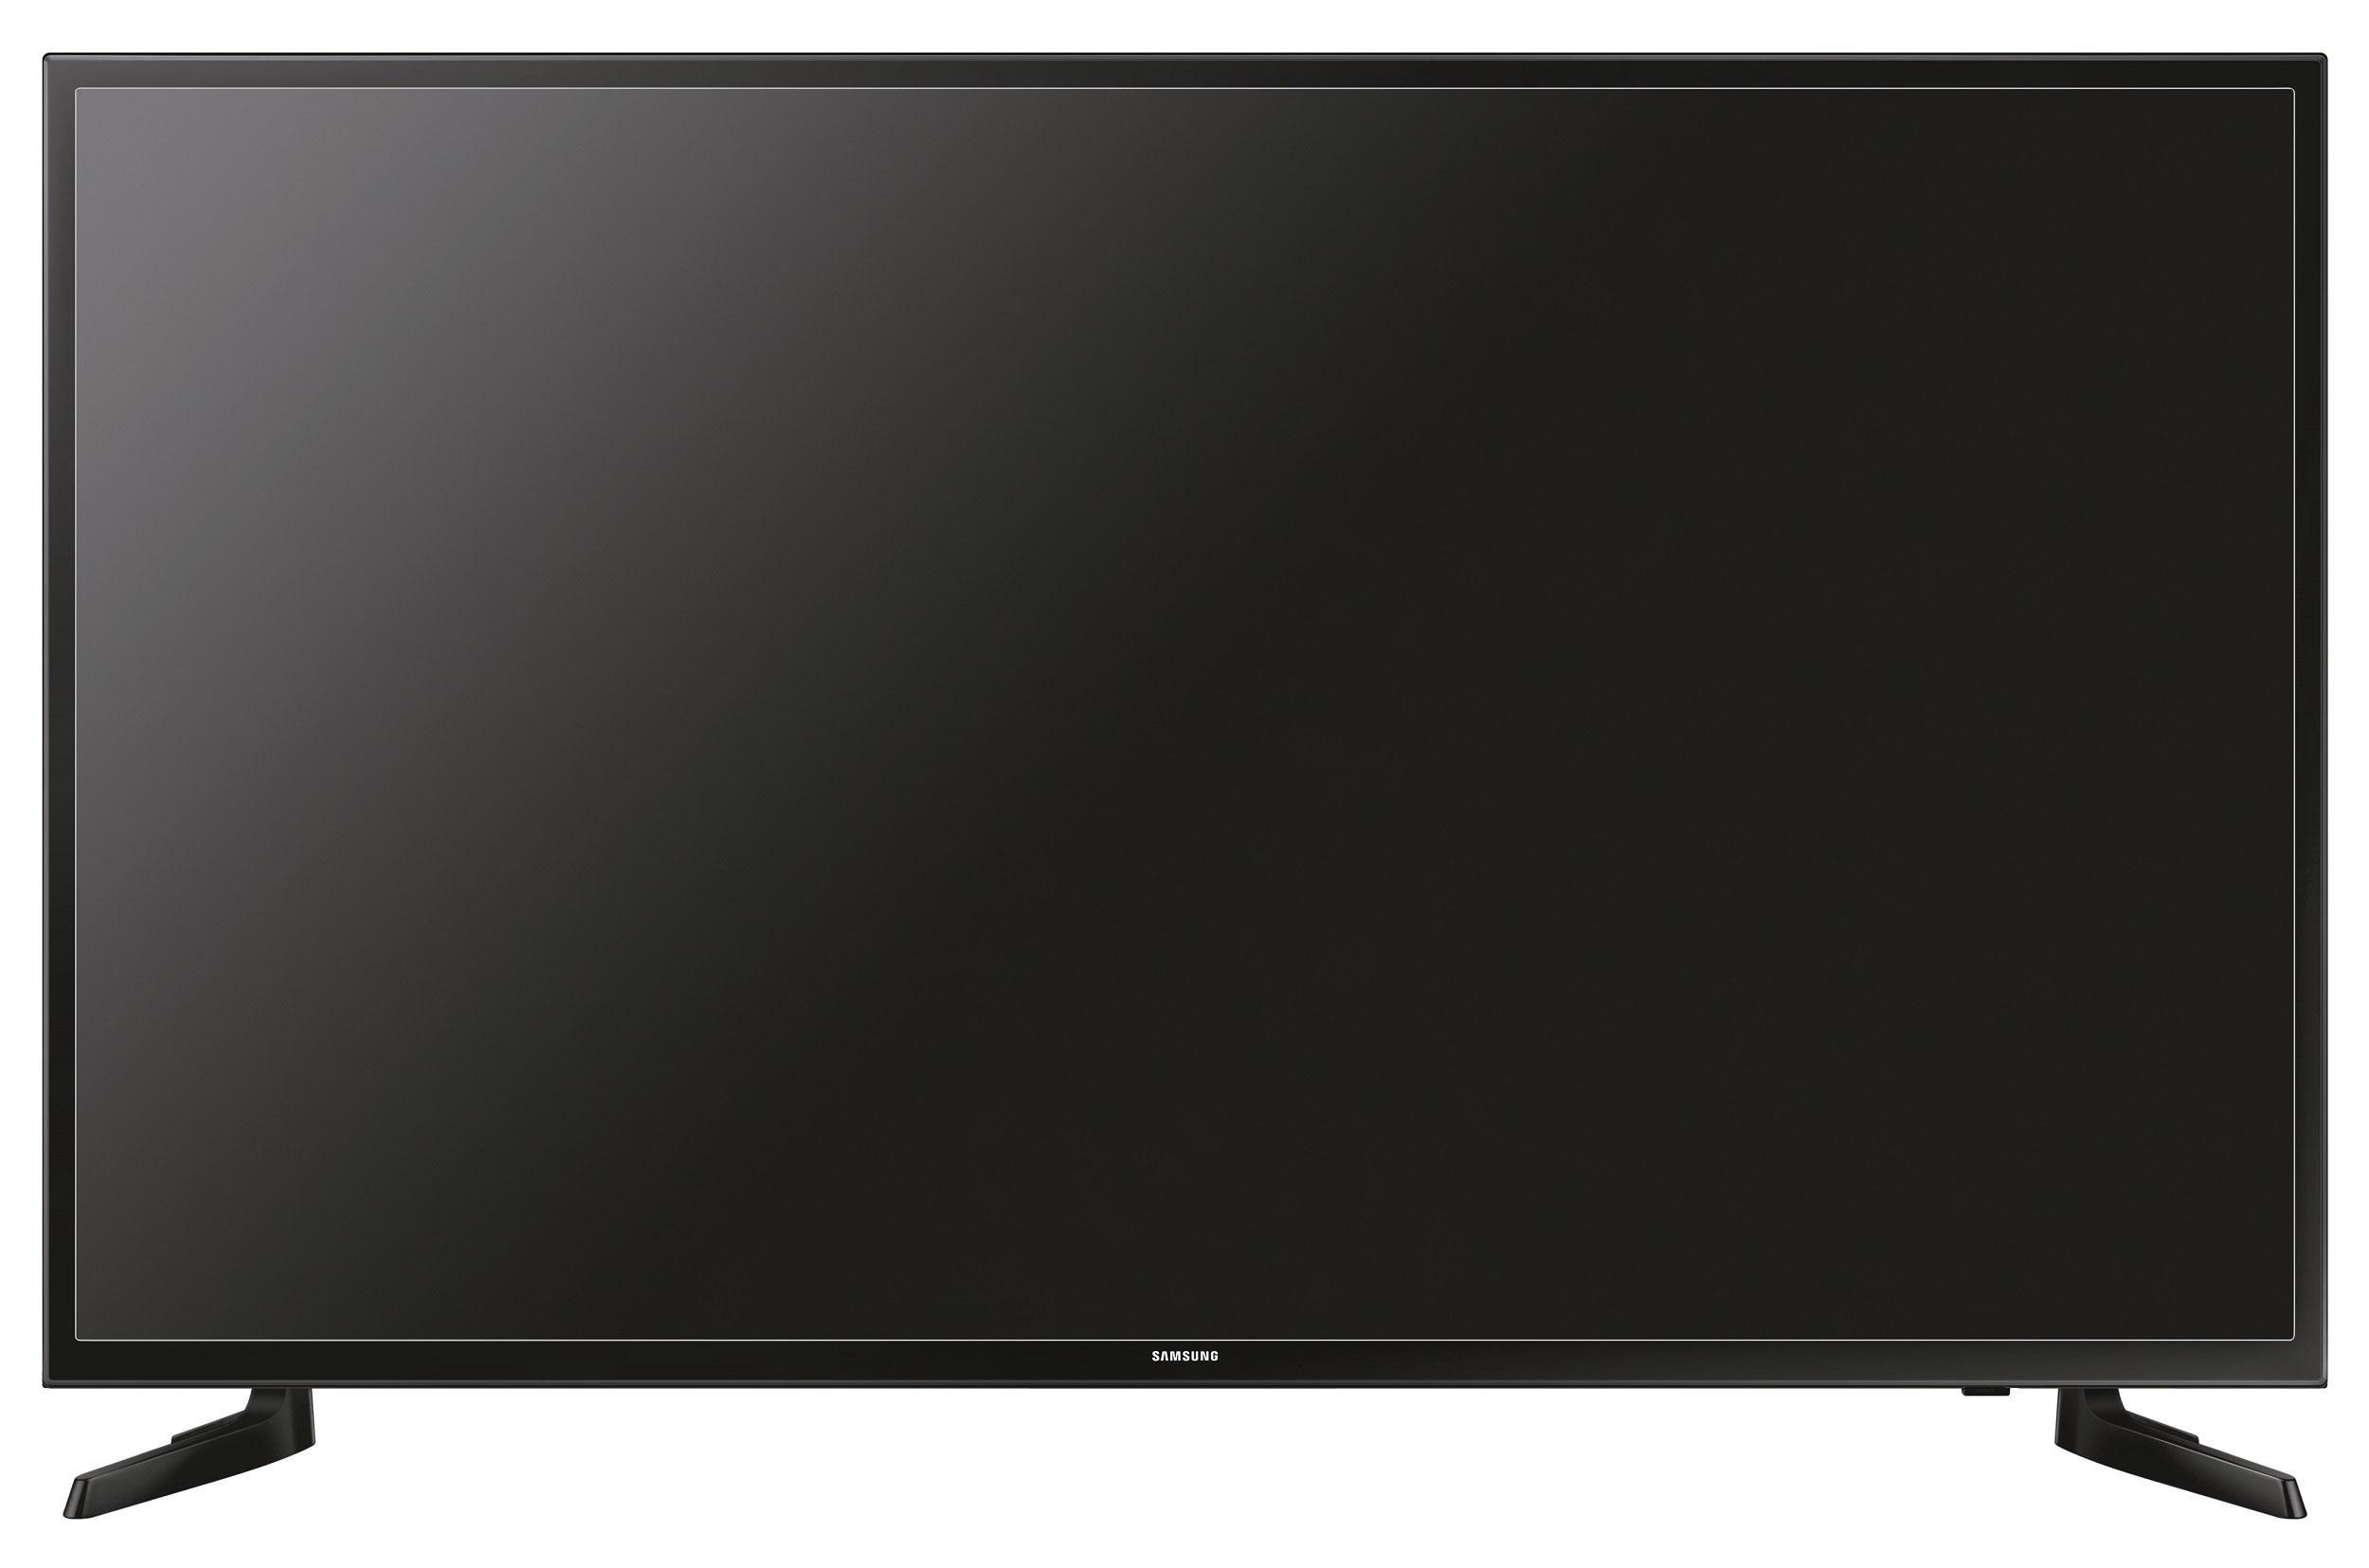 samsung ue55ju6050 138 cm 55 zoll fernseher ultra hd. Black Bedroom Furniture Sets. Home Design Ideas